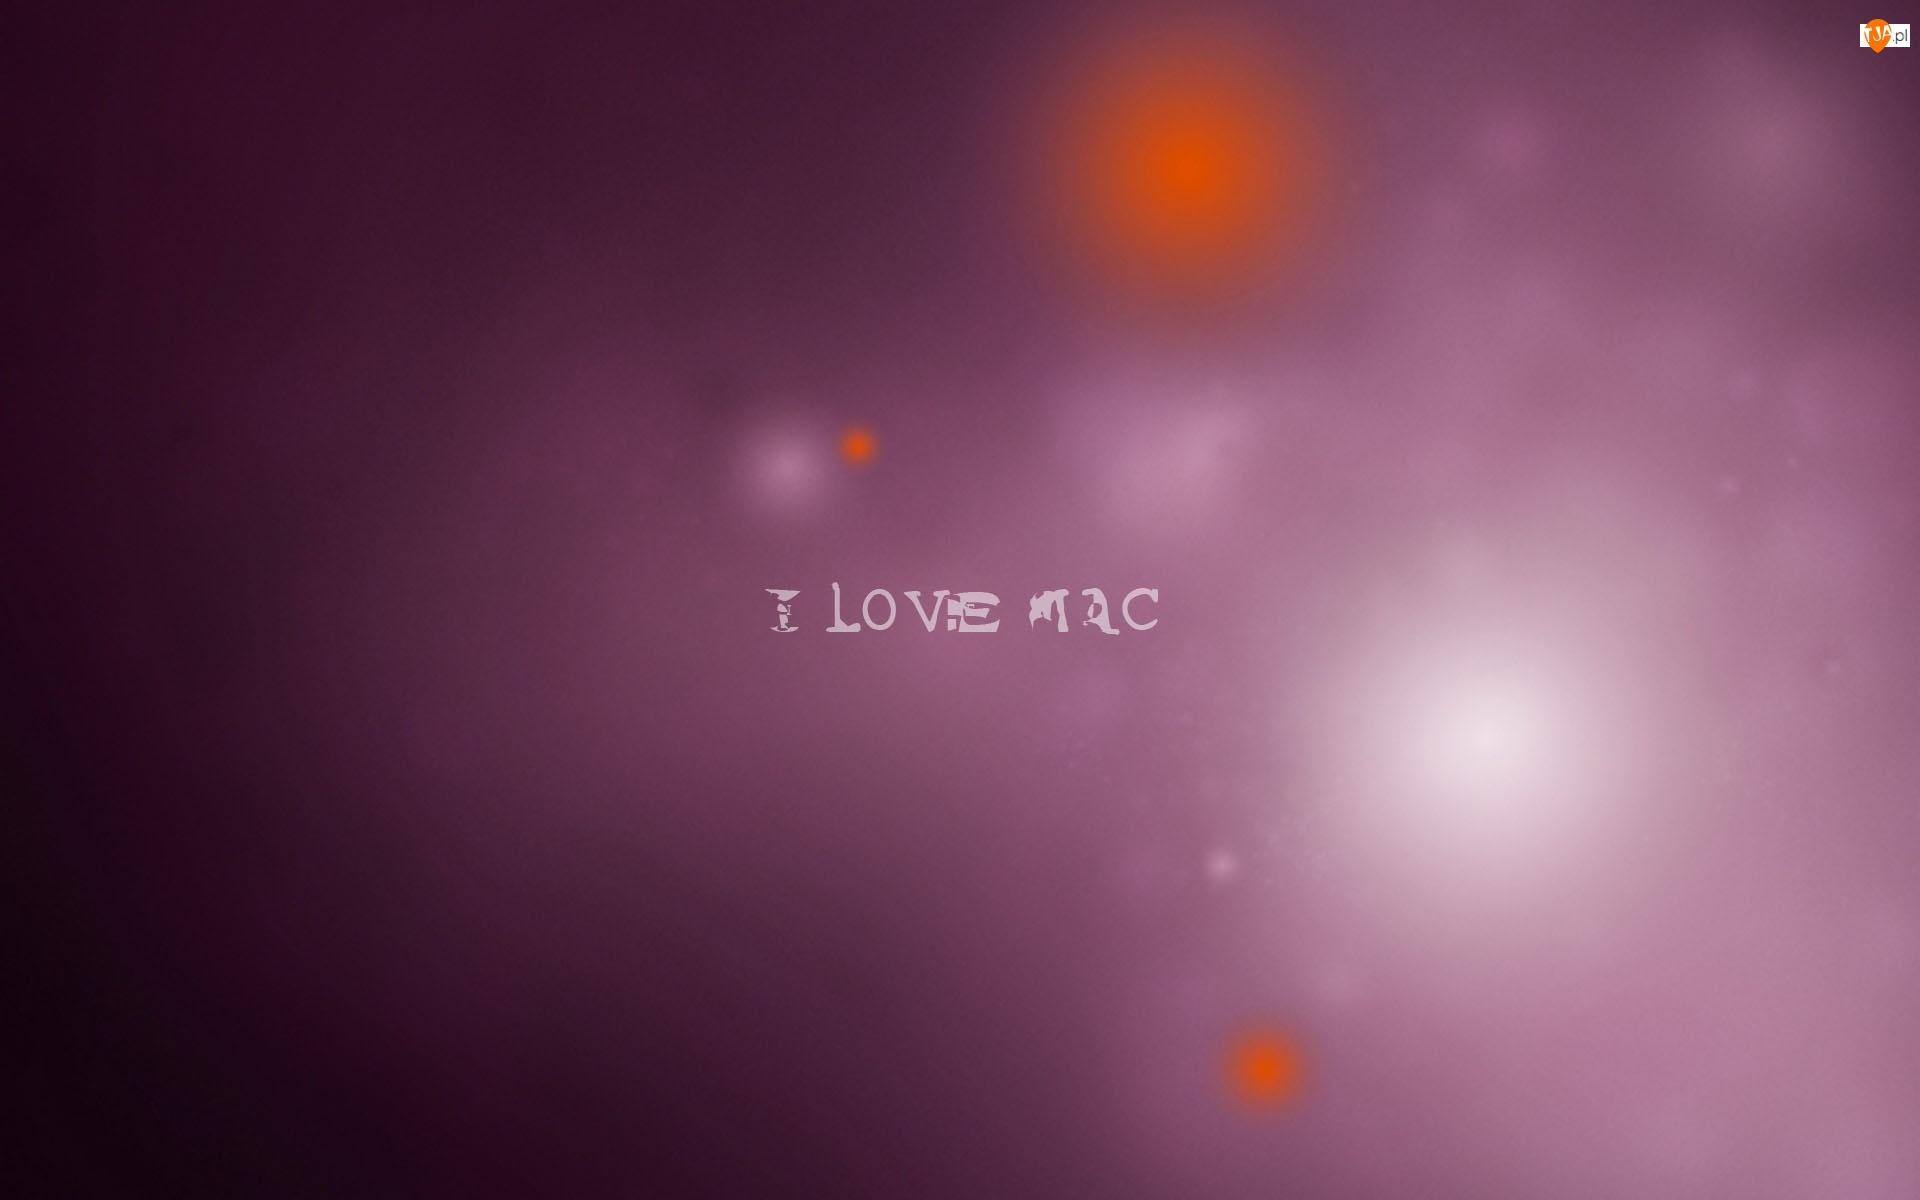 Apple, Mac